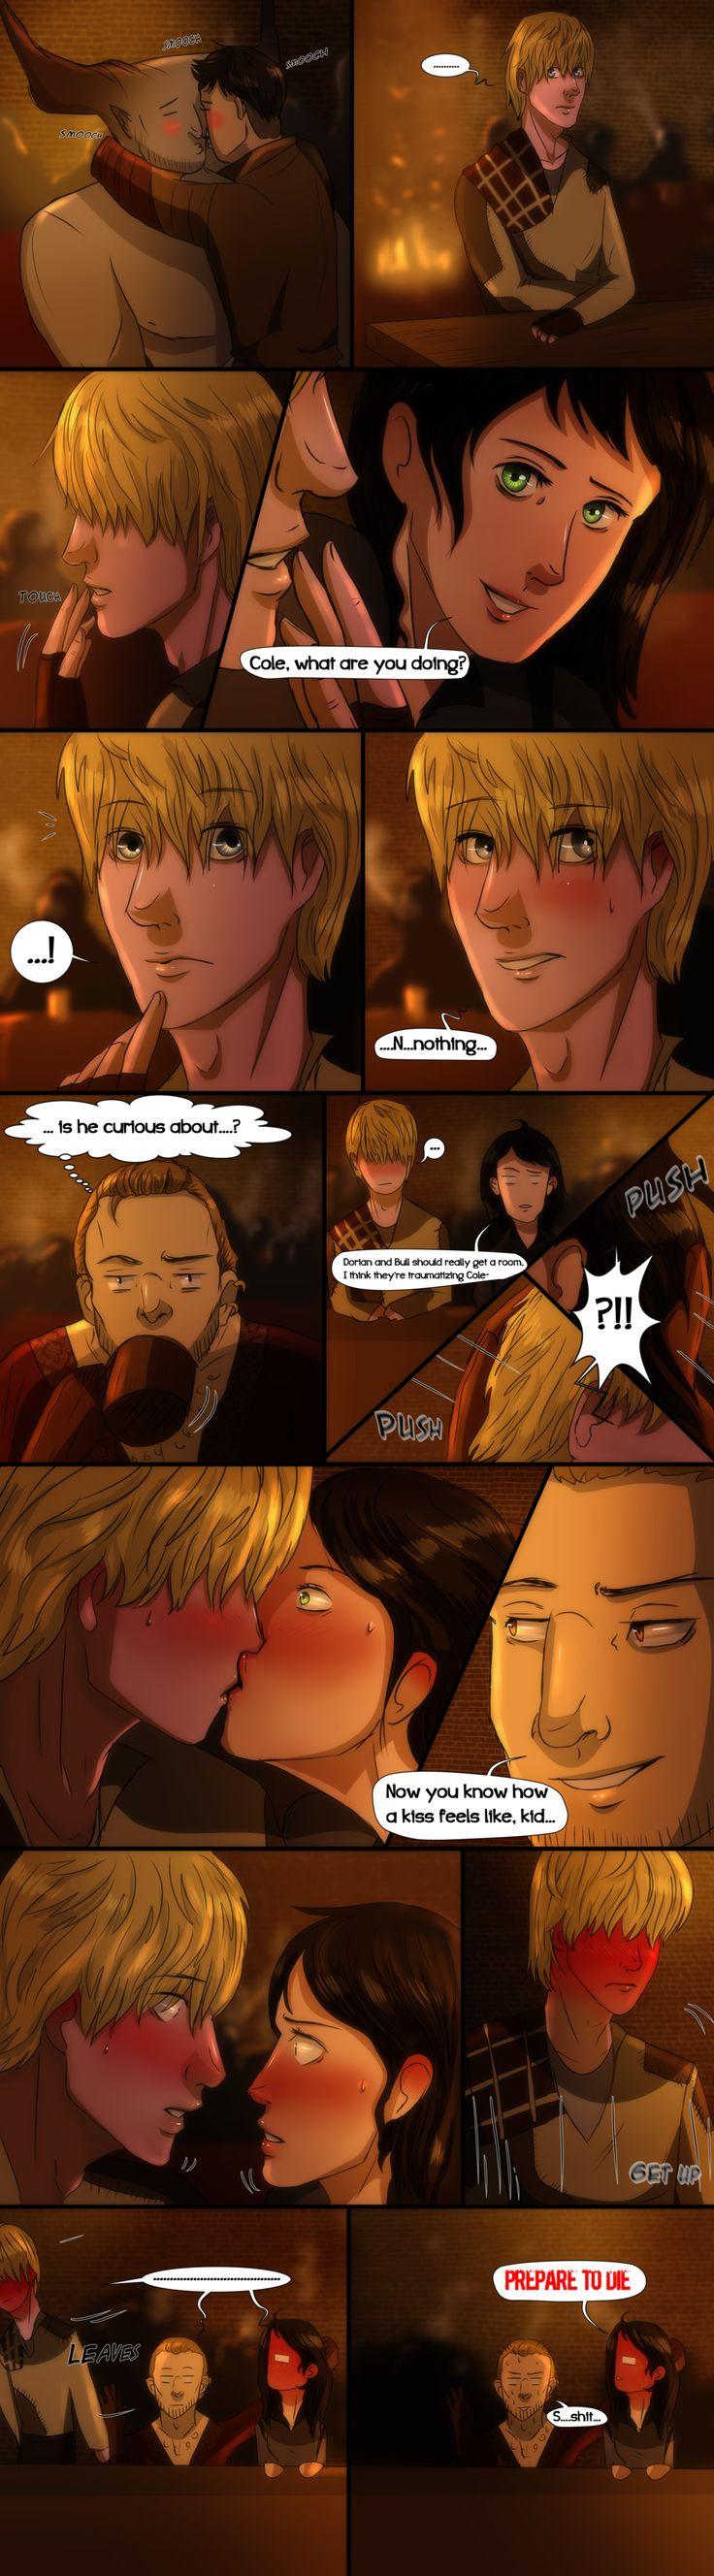 Dragon Age Inquisition- Comic- First Kiss by MsArtisticStuff on DeviantArt